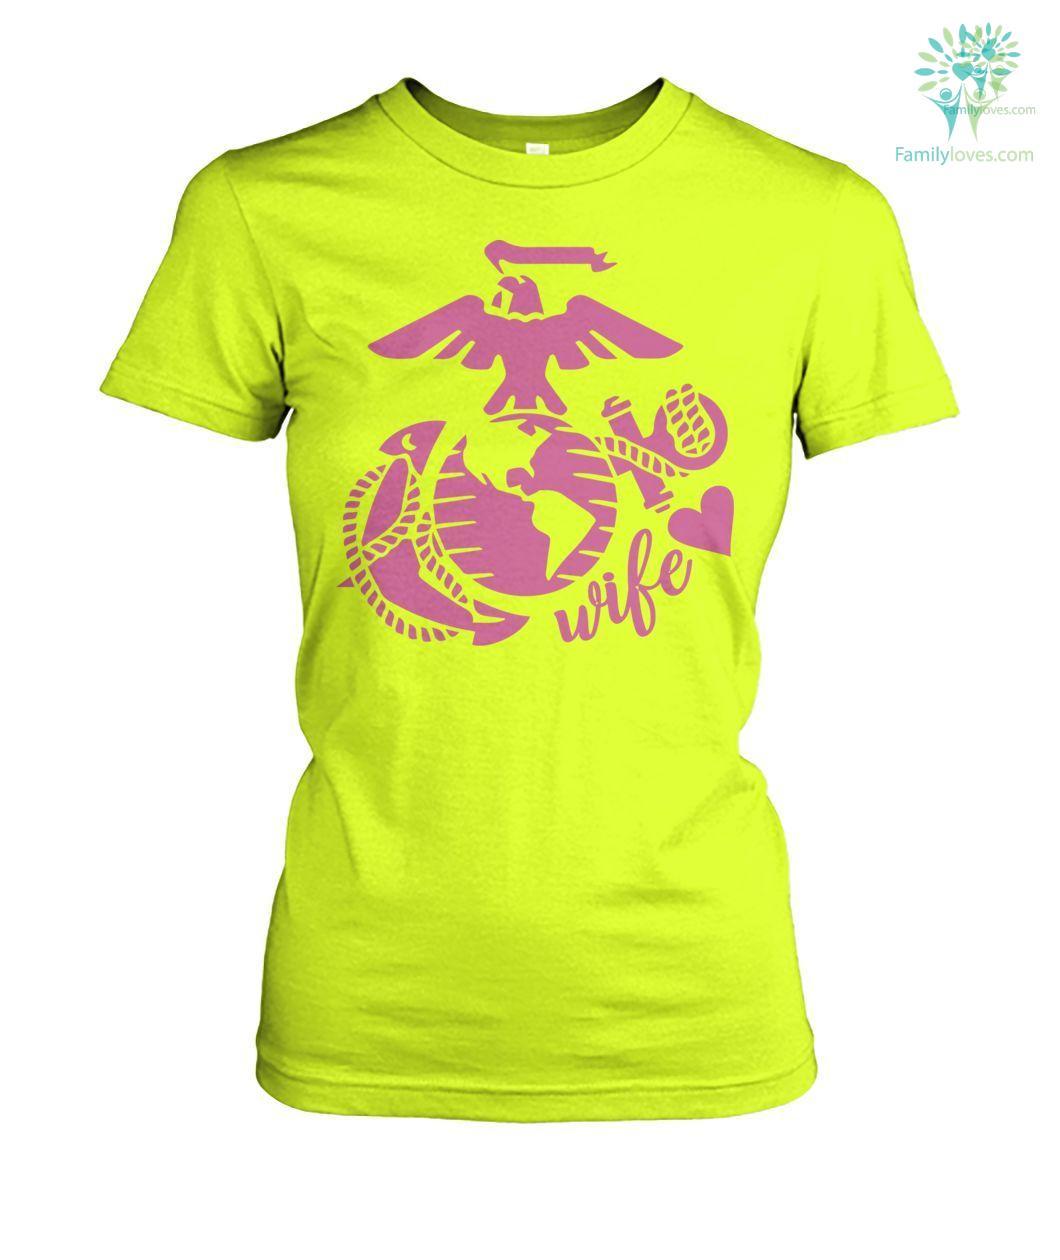 Wife Marines women t-shirt, hoodie Familyloves.com